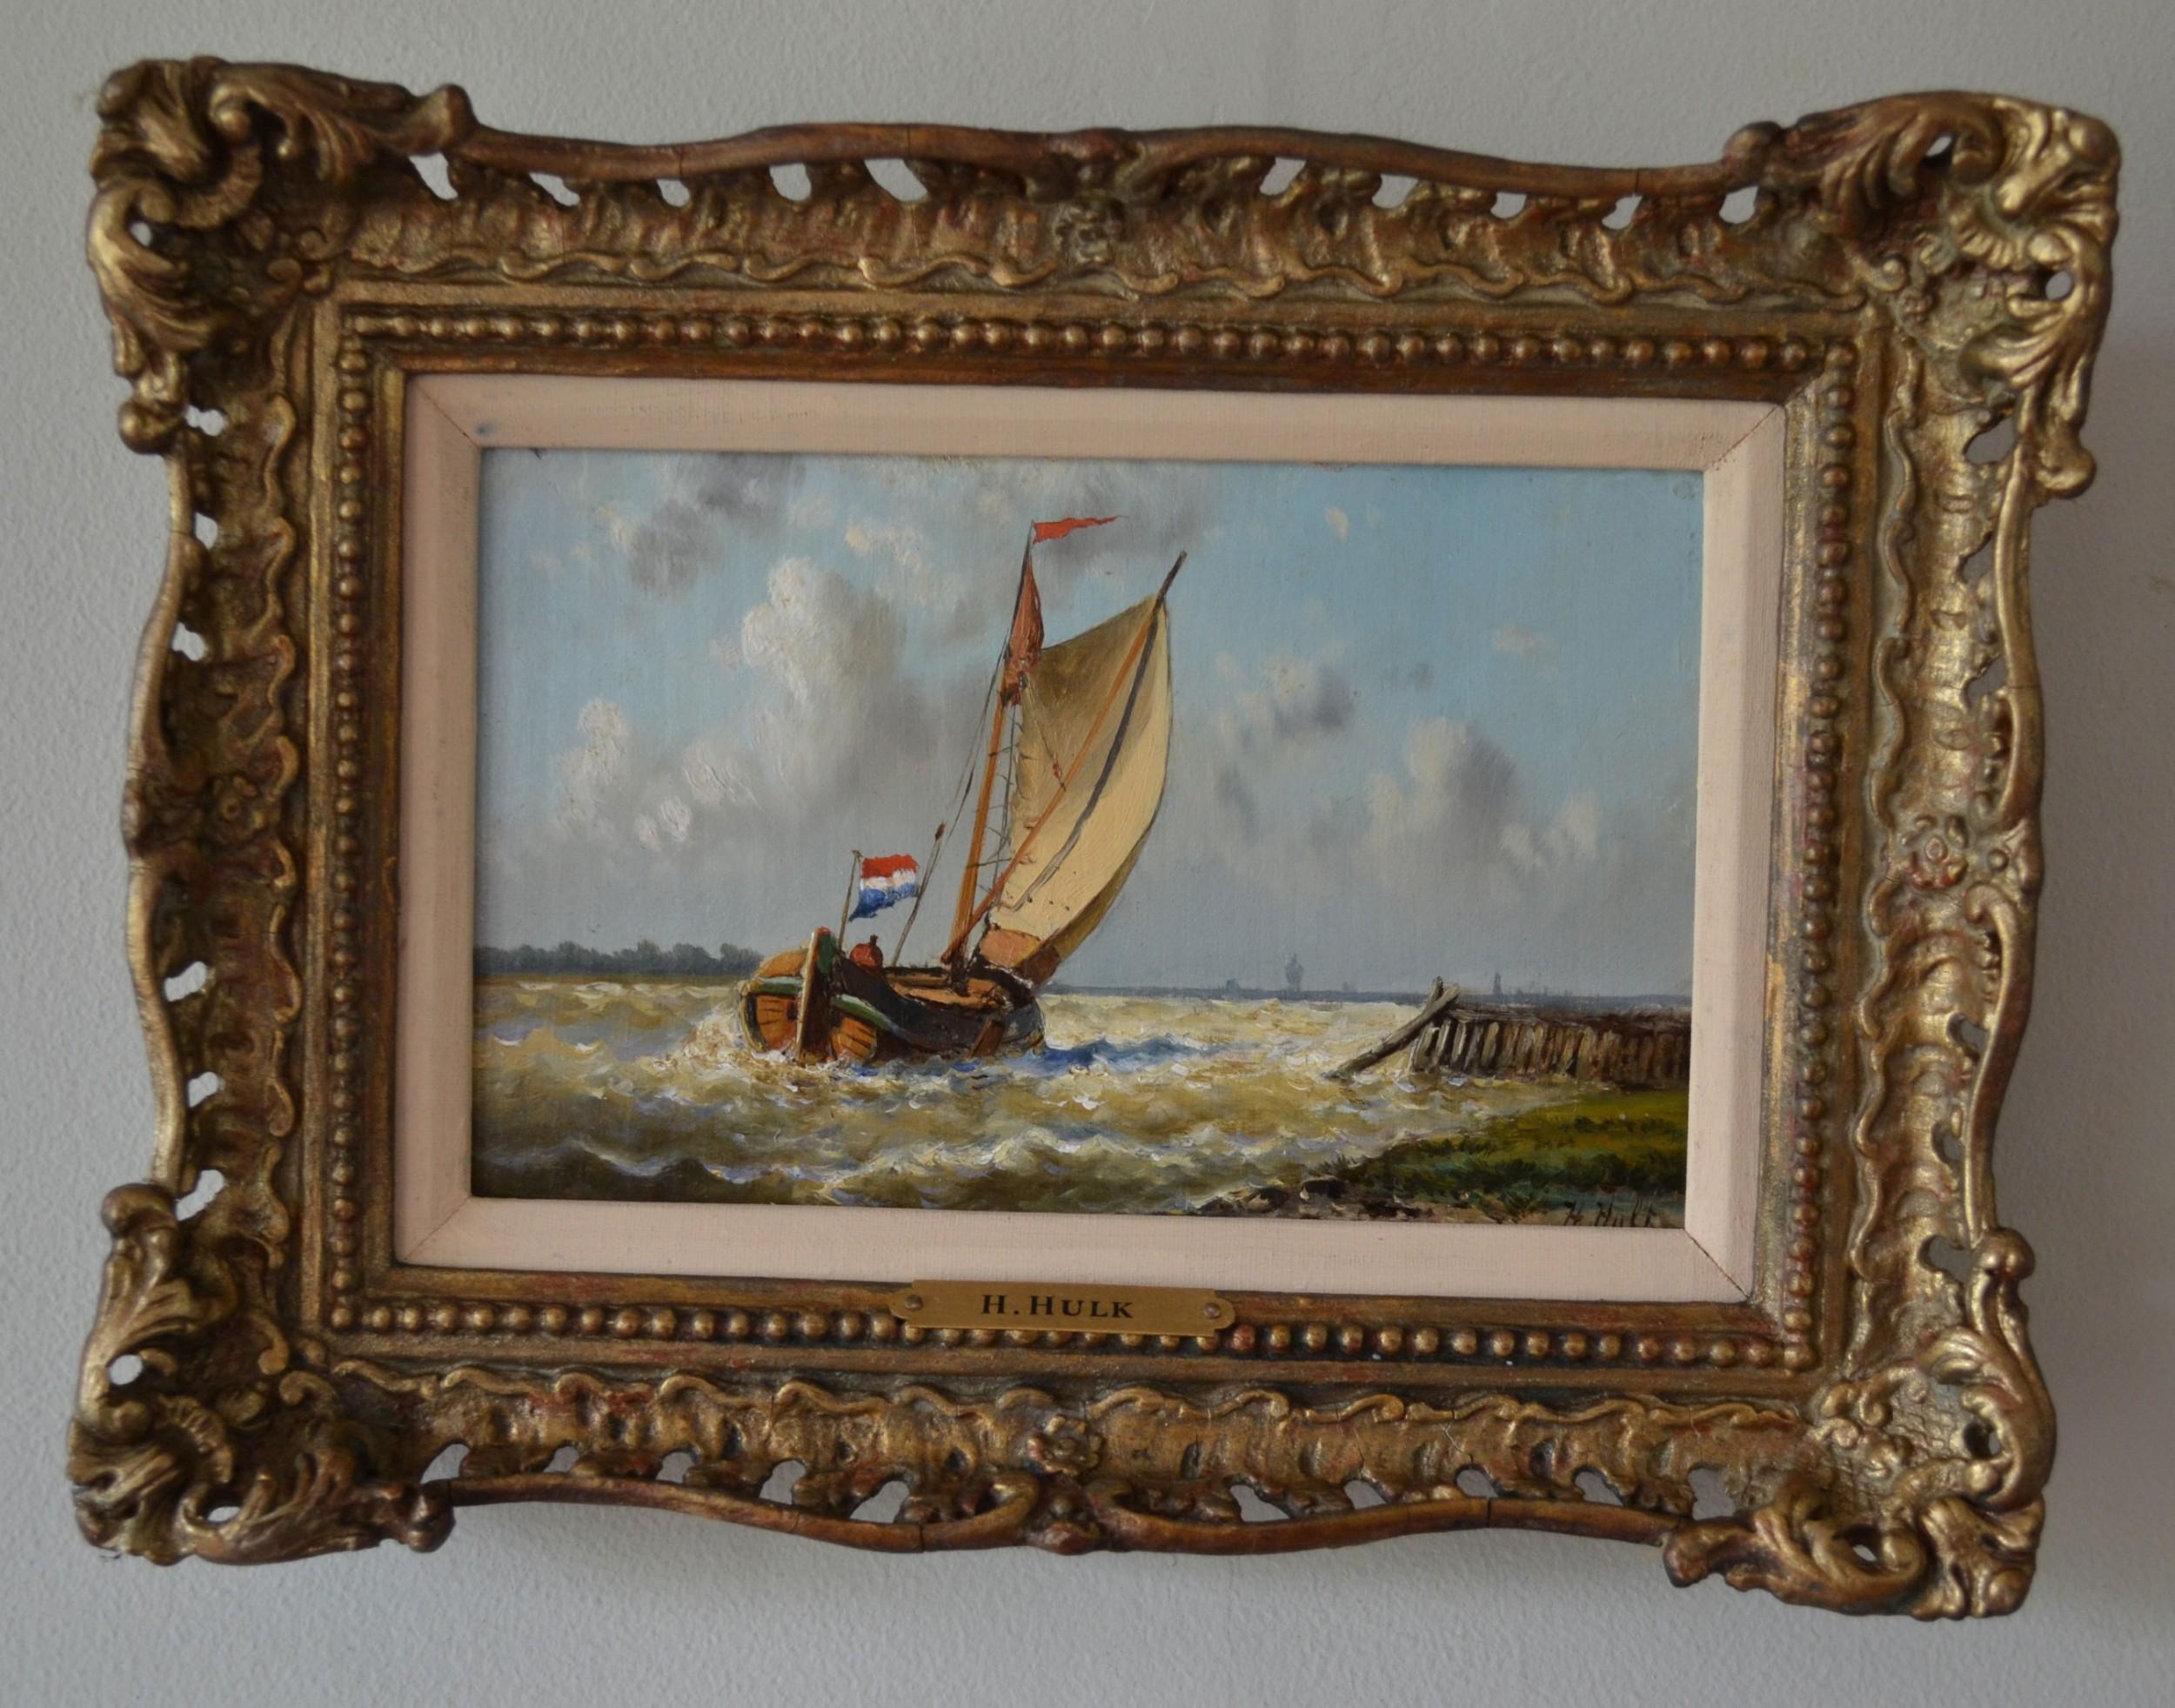 pair seascapes fishing off the dutch coast c 1914 oil paintings on panel hendrik hulk 18421937